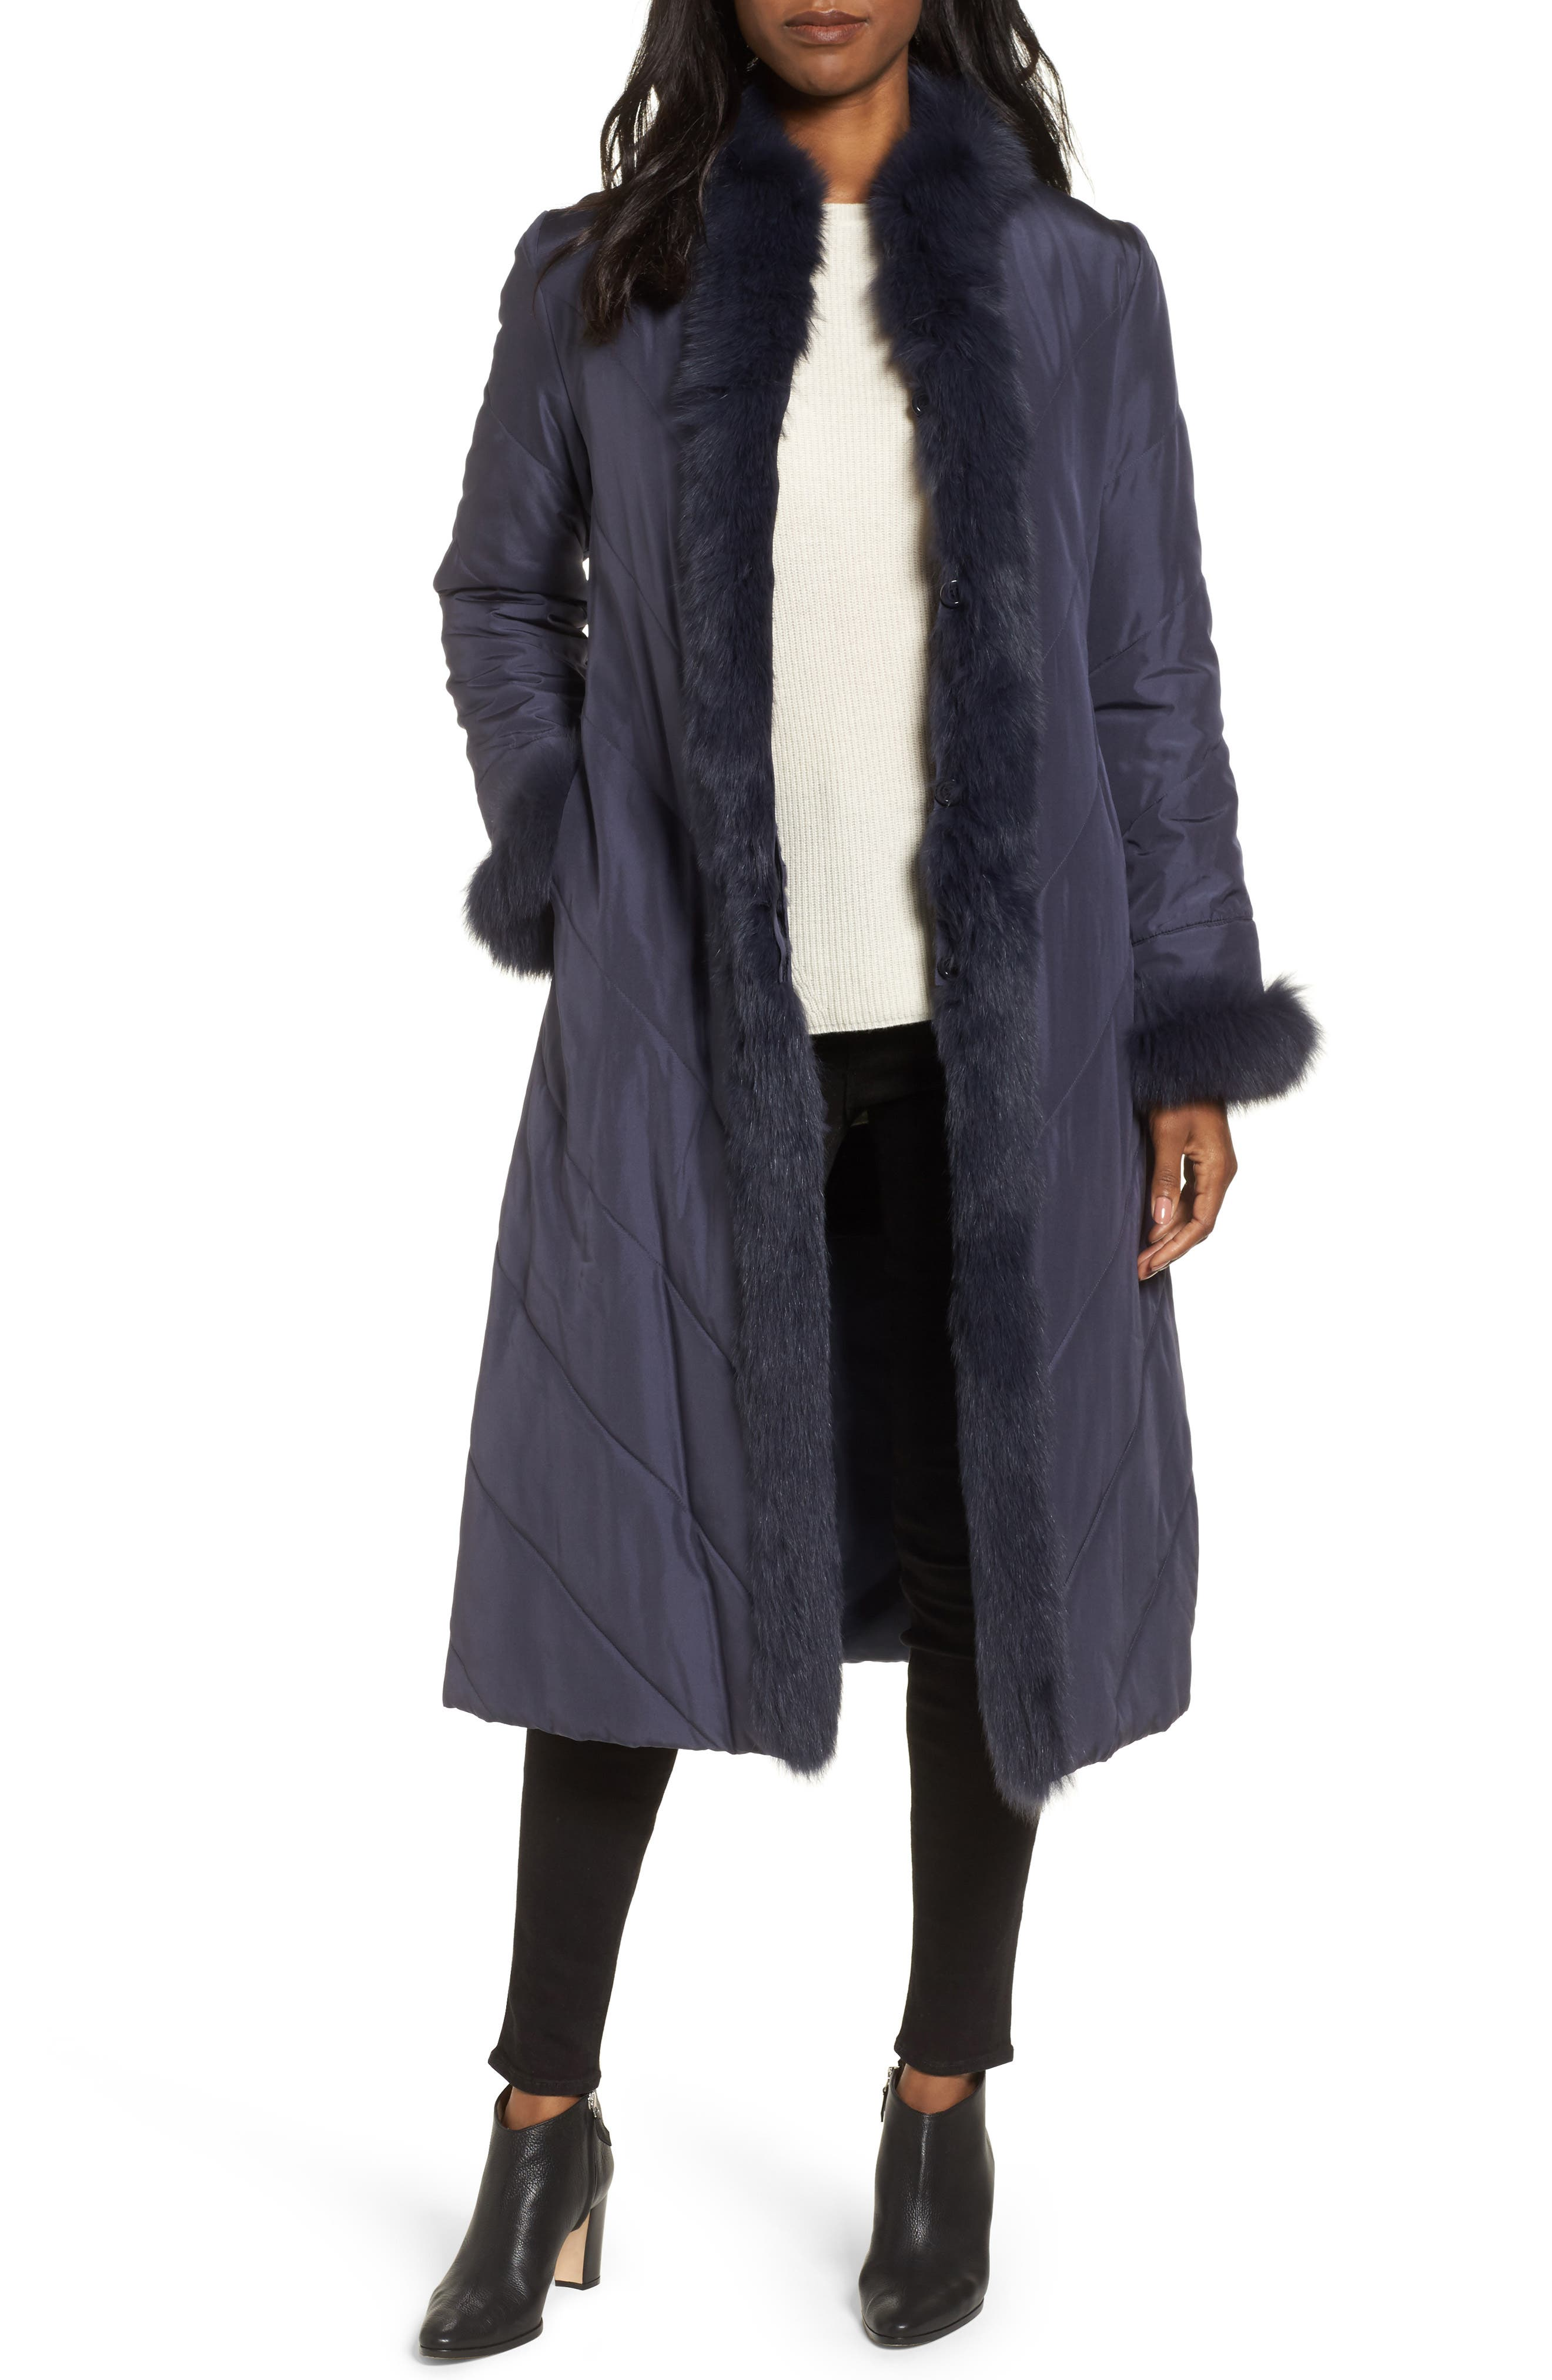 Alternate Image 1 Selected - George Simonton Couture Packable Silk Coat with Genuine Fox Fur & Genuine Rabbit Fur